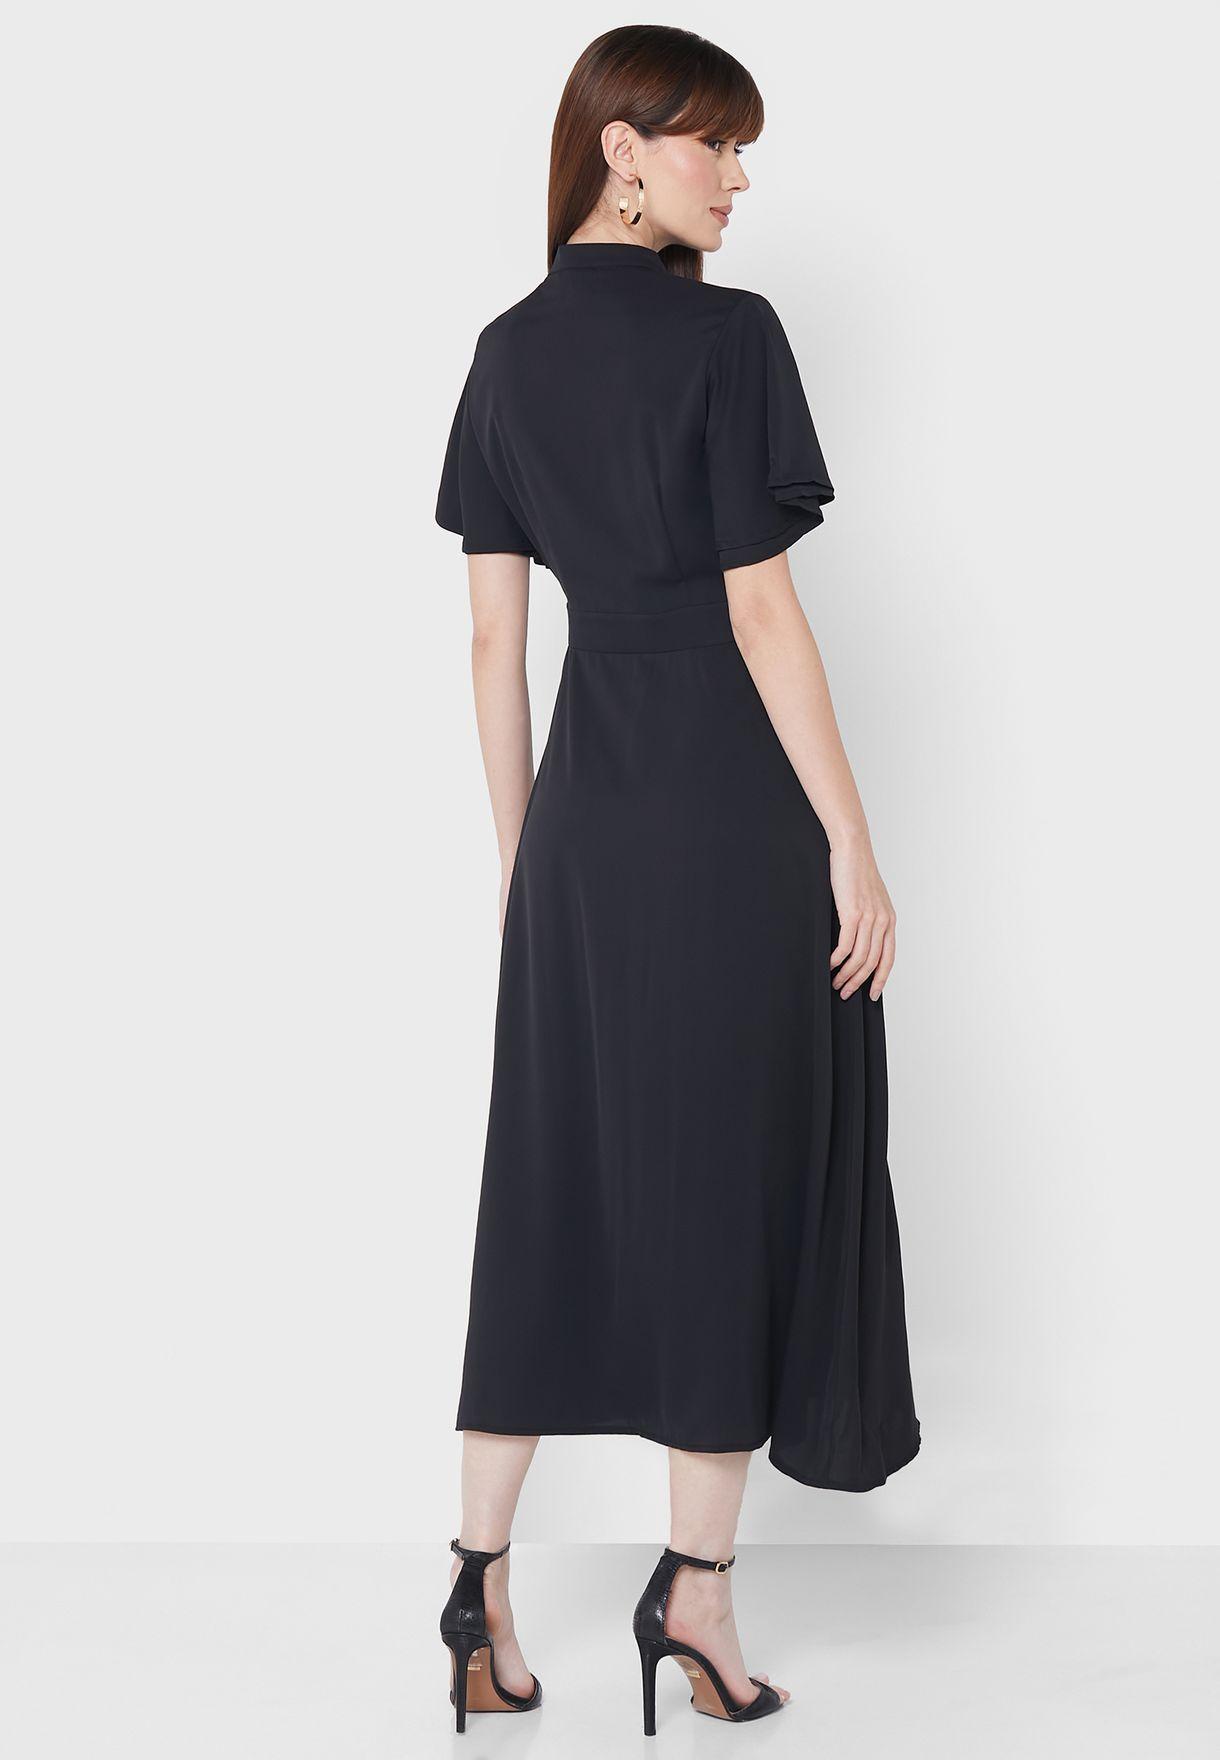 فستان باكمام طبقات